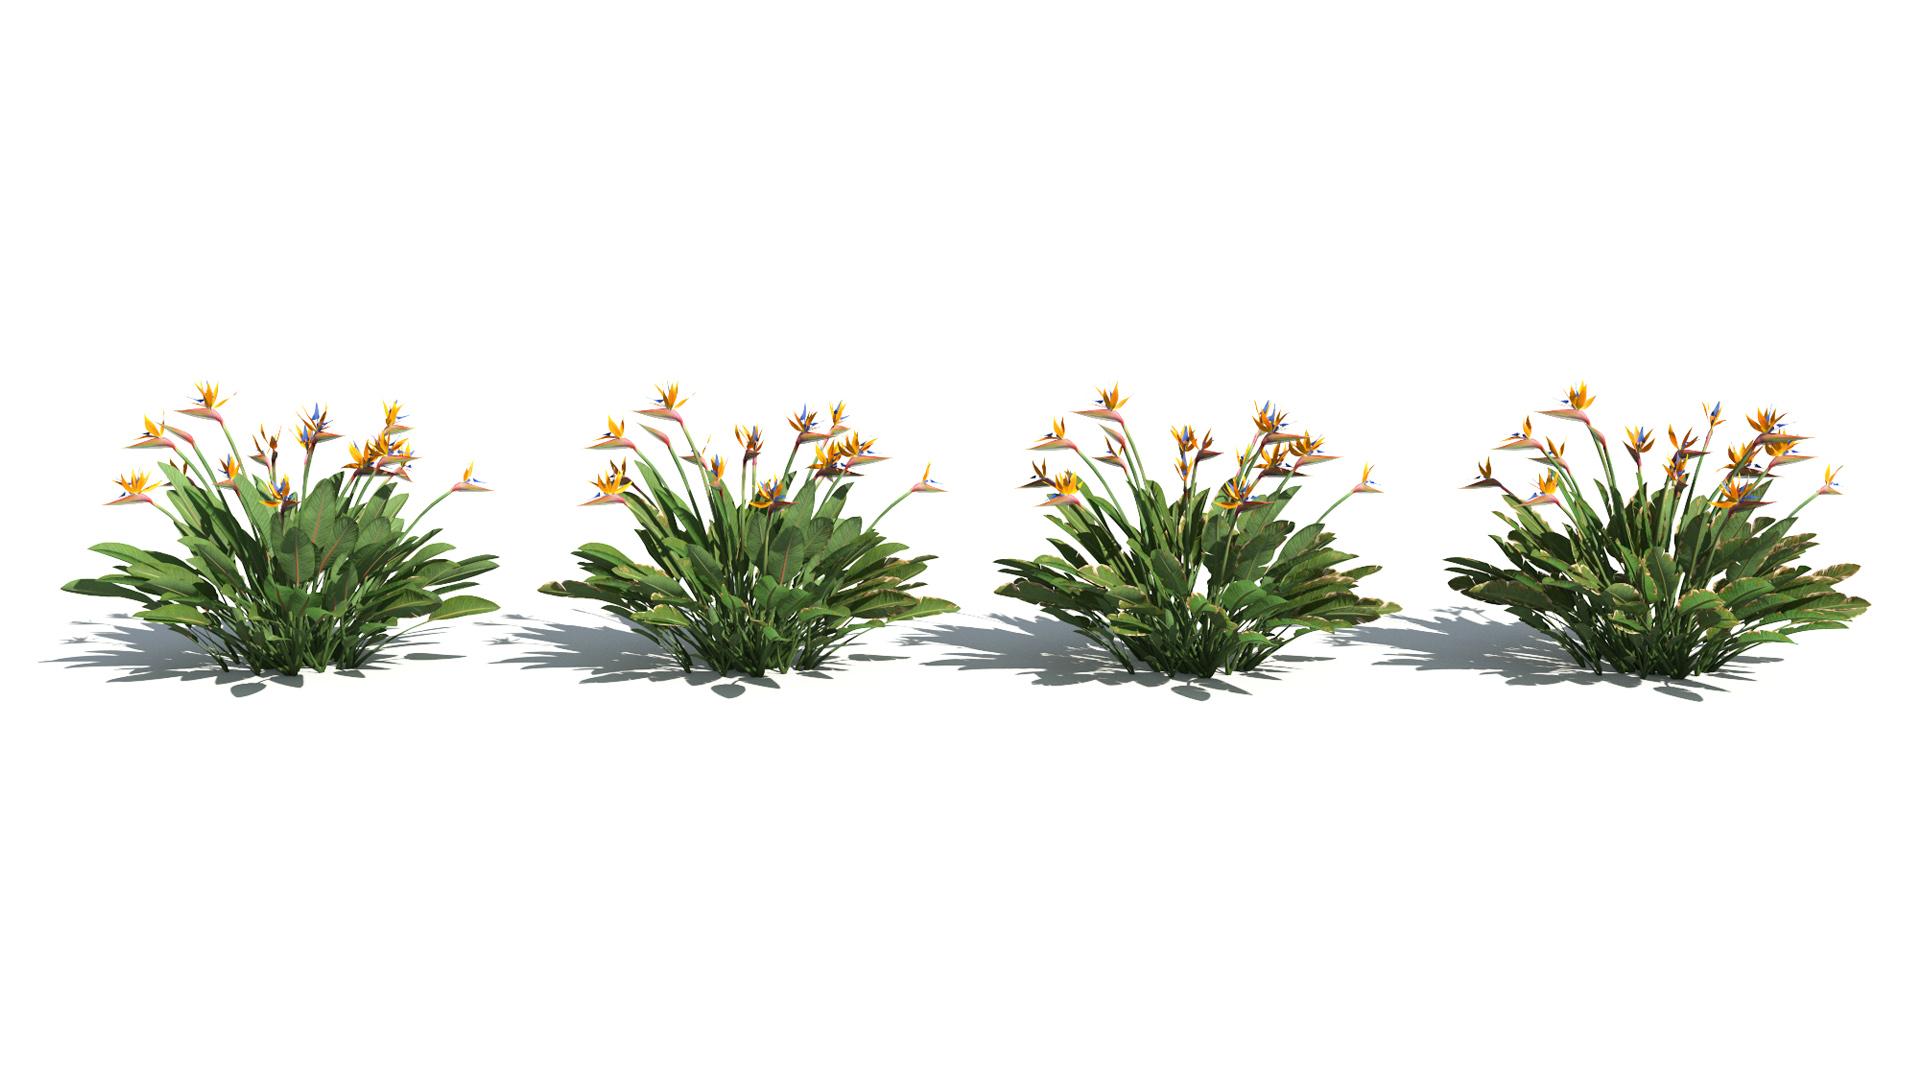 3D model of the Narrow leaved bird of paradise Strelitzia juncea health variations